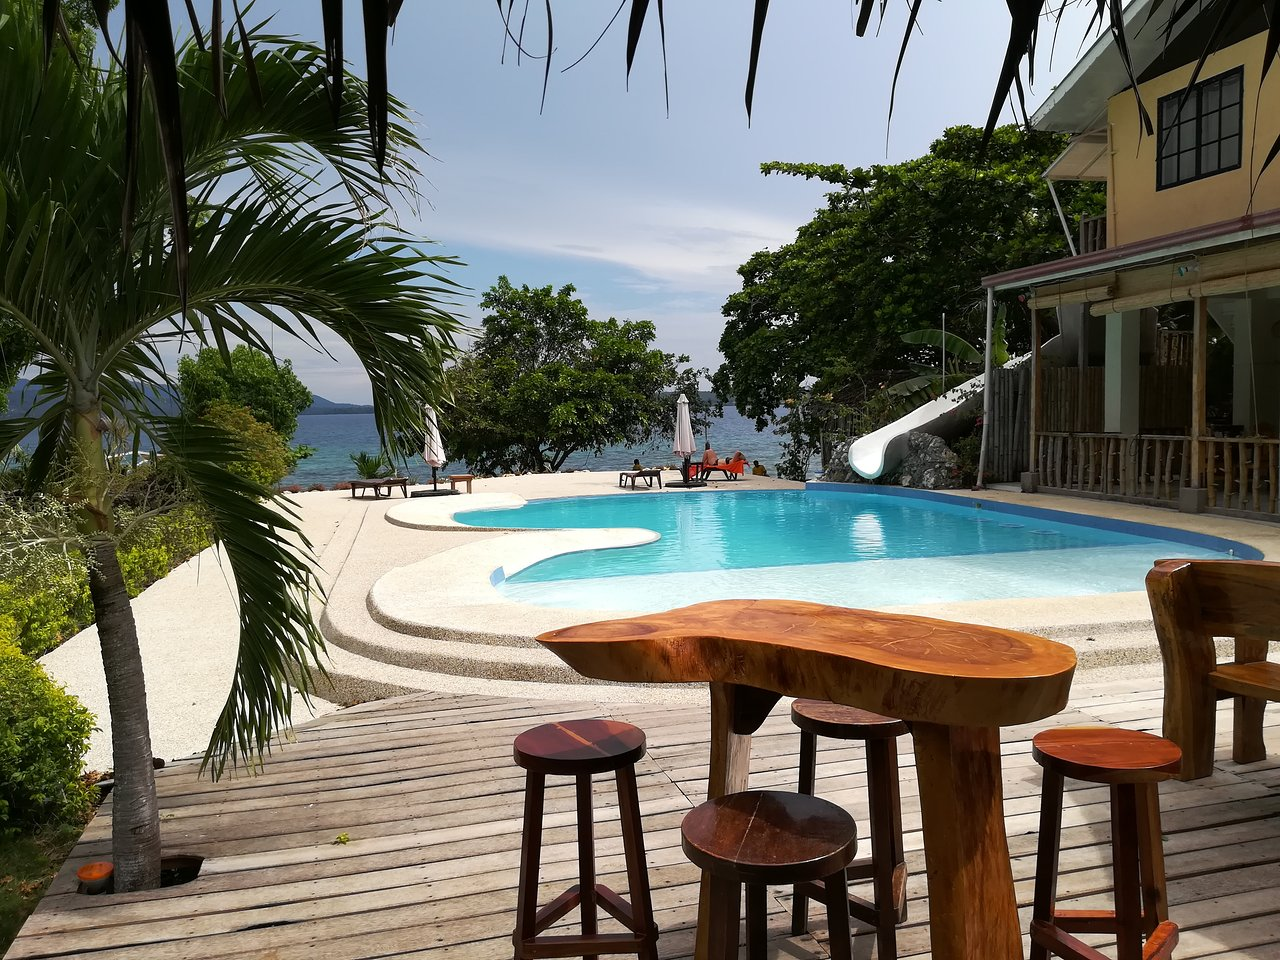 isla hayahay 35 5 8 updated 2019 prices resort reviews rh tripadvisor com